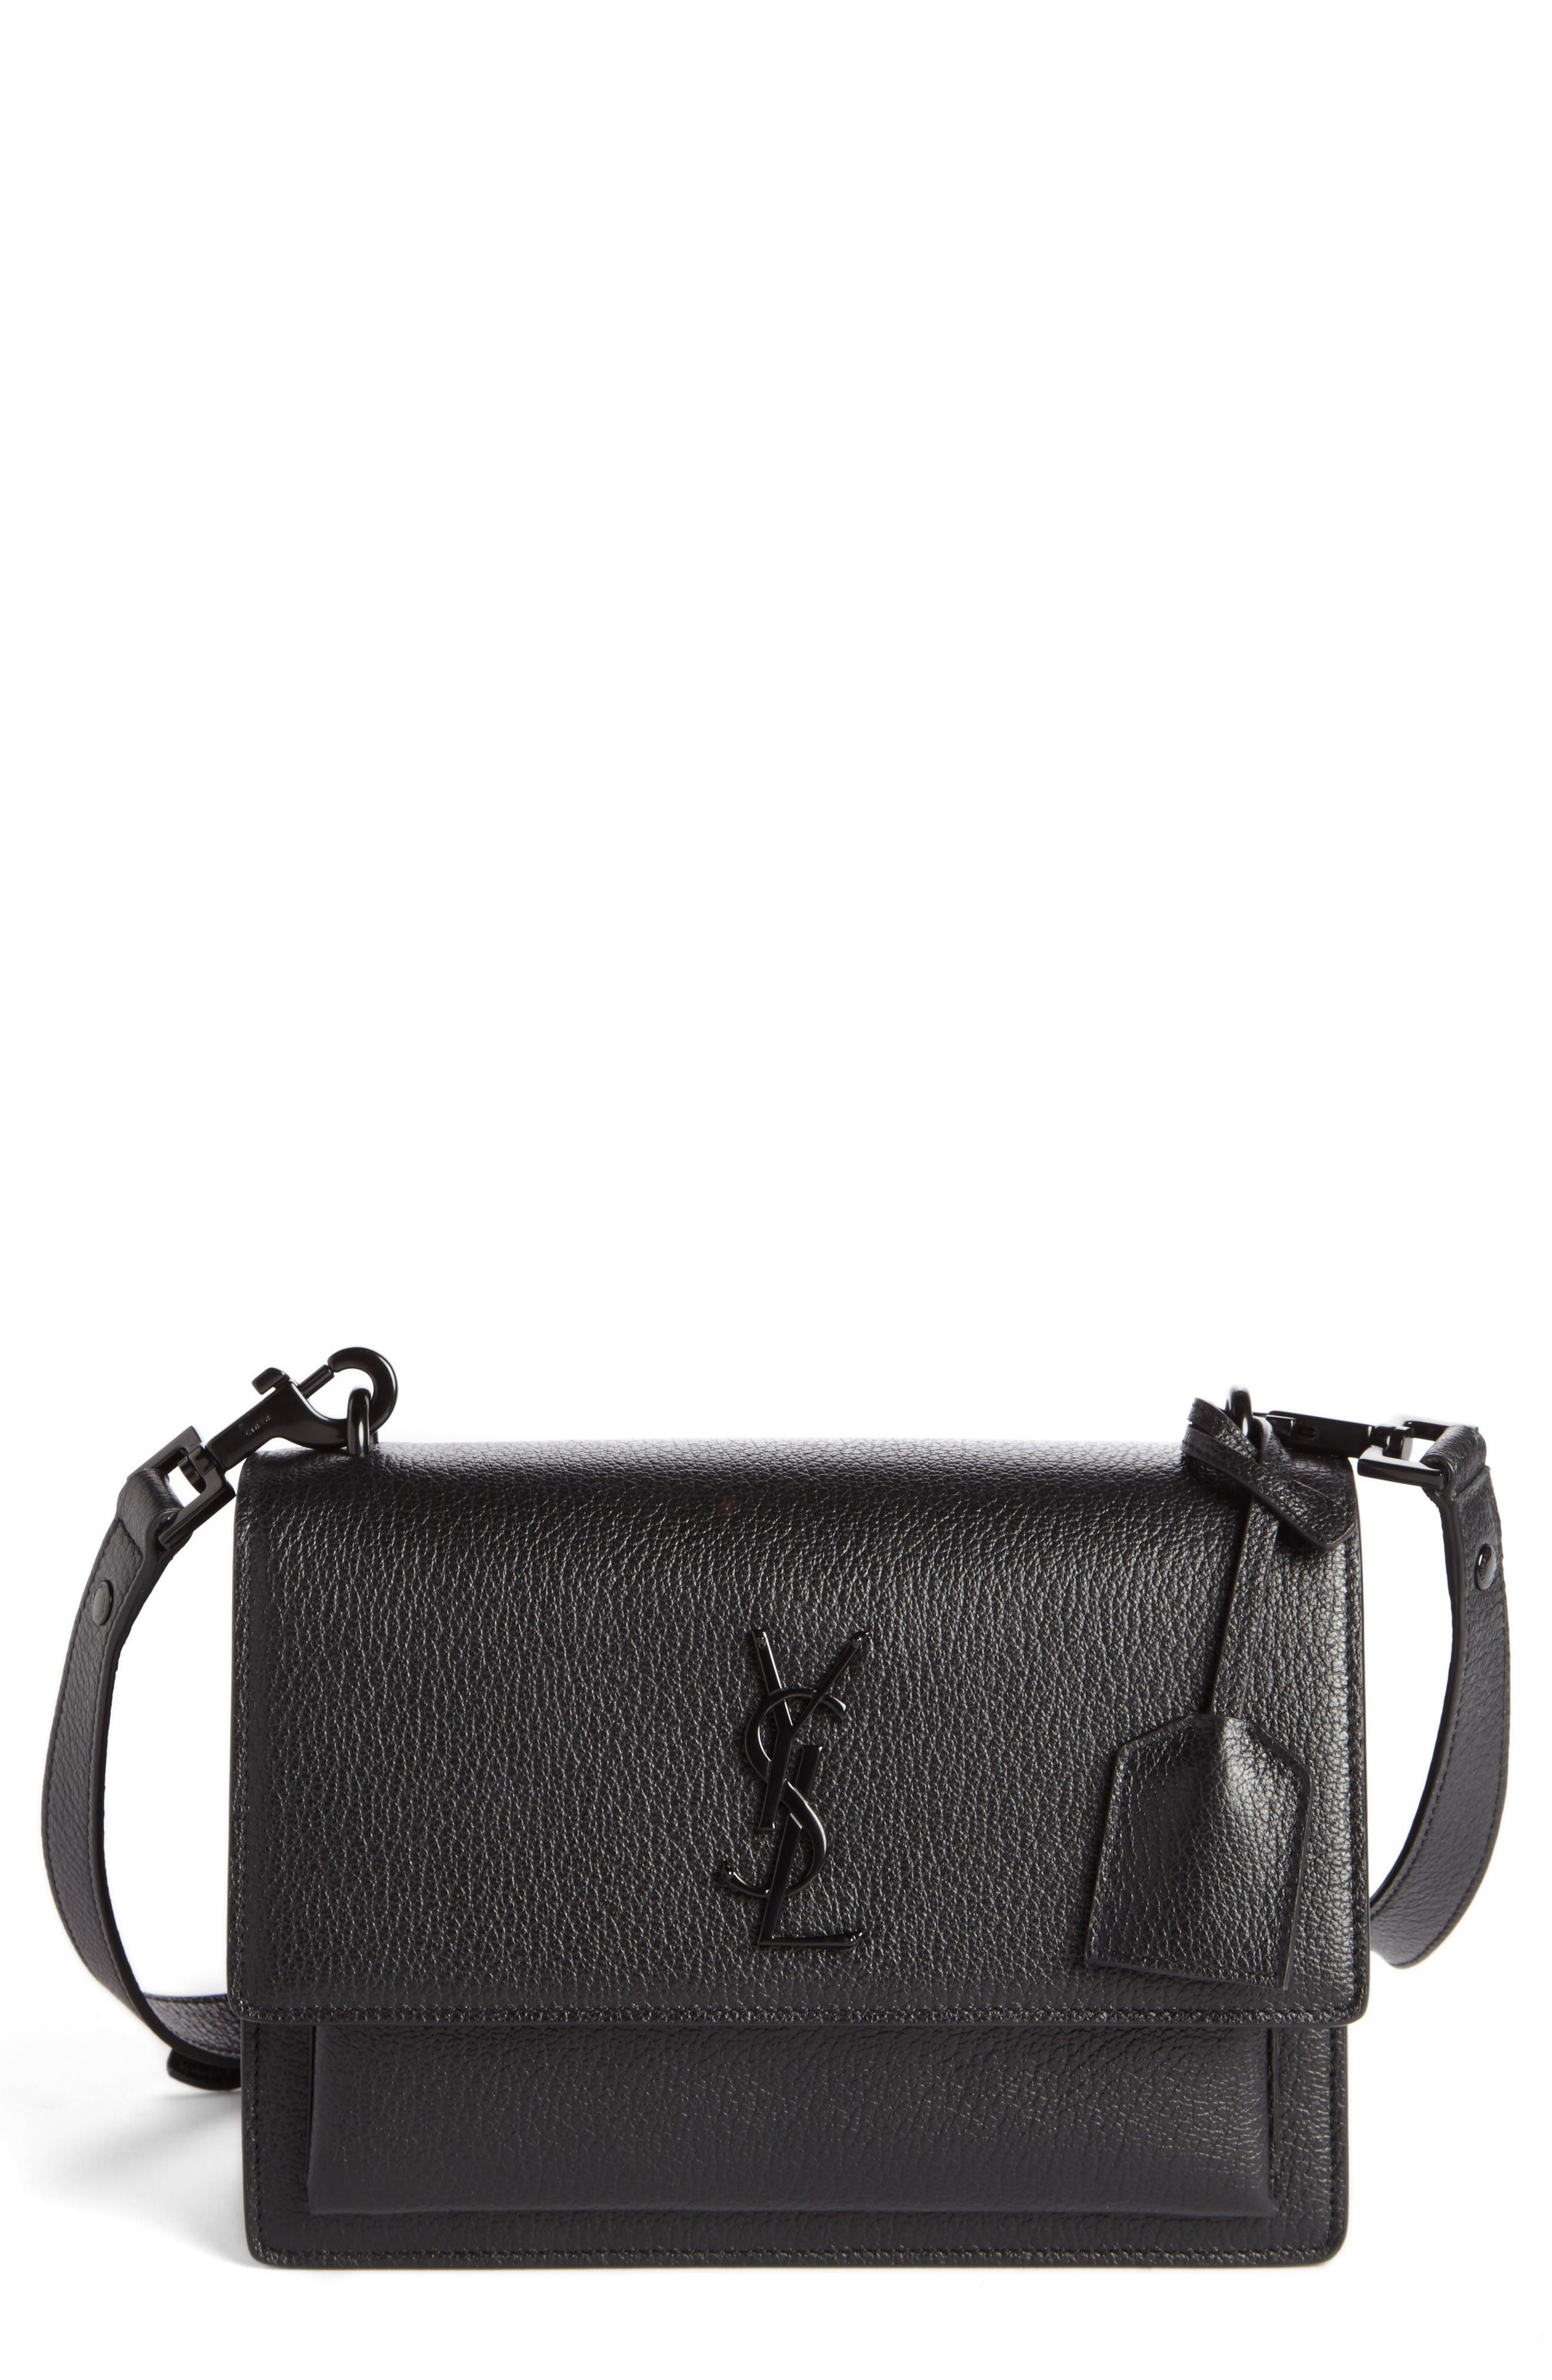 Main Image - Saint Laurent Medium Sunset Leather Shoulder Bag